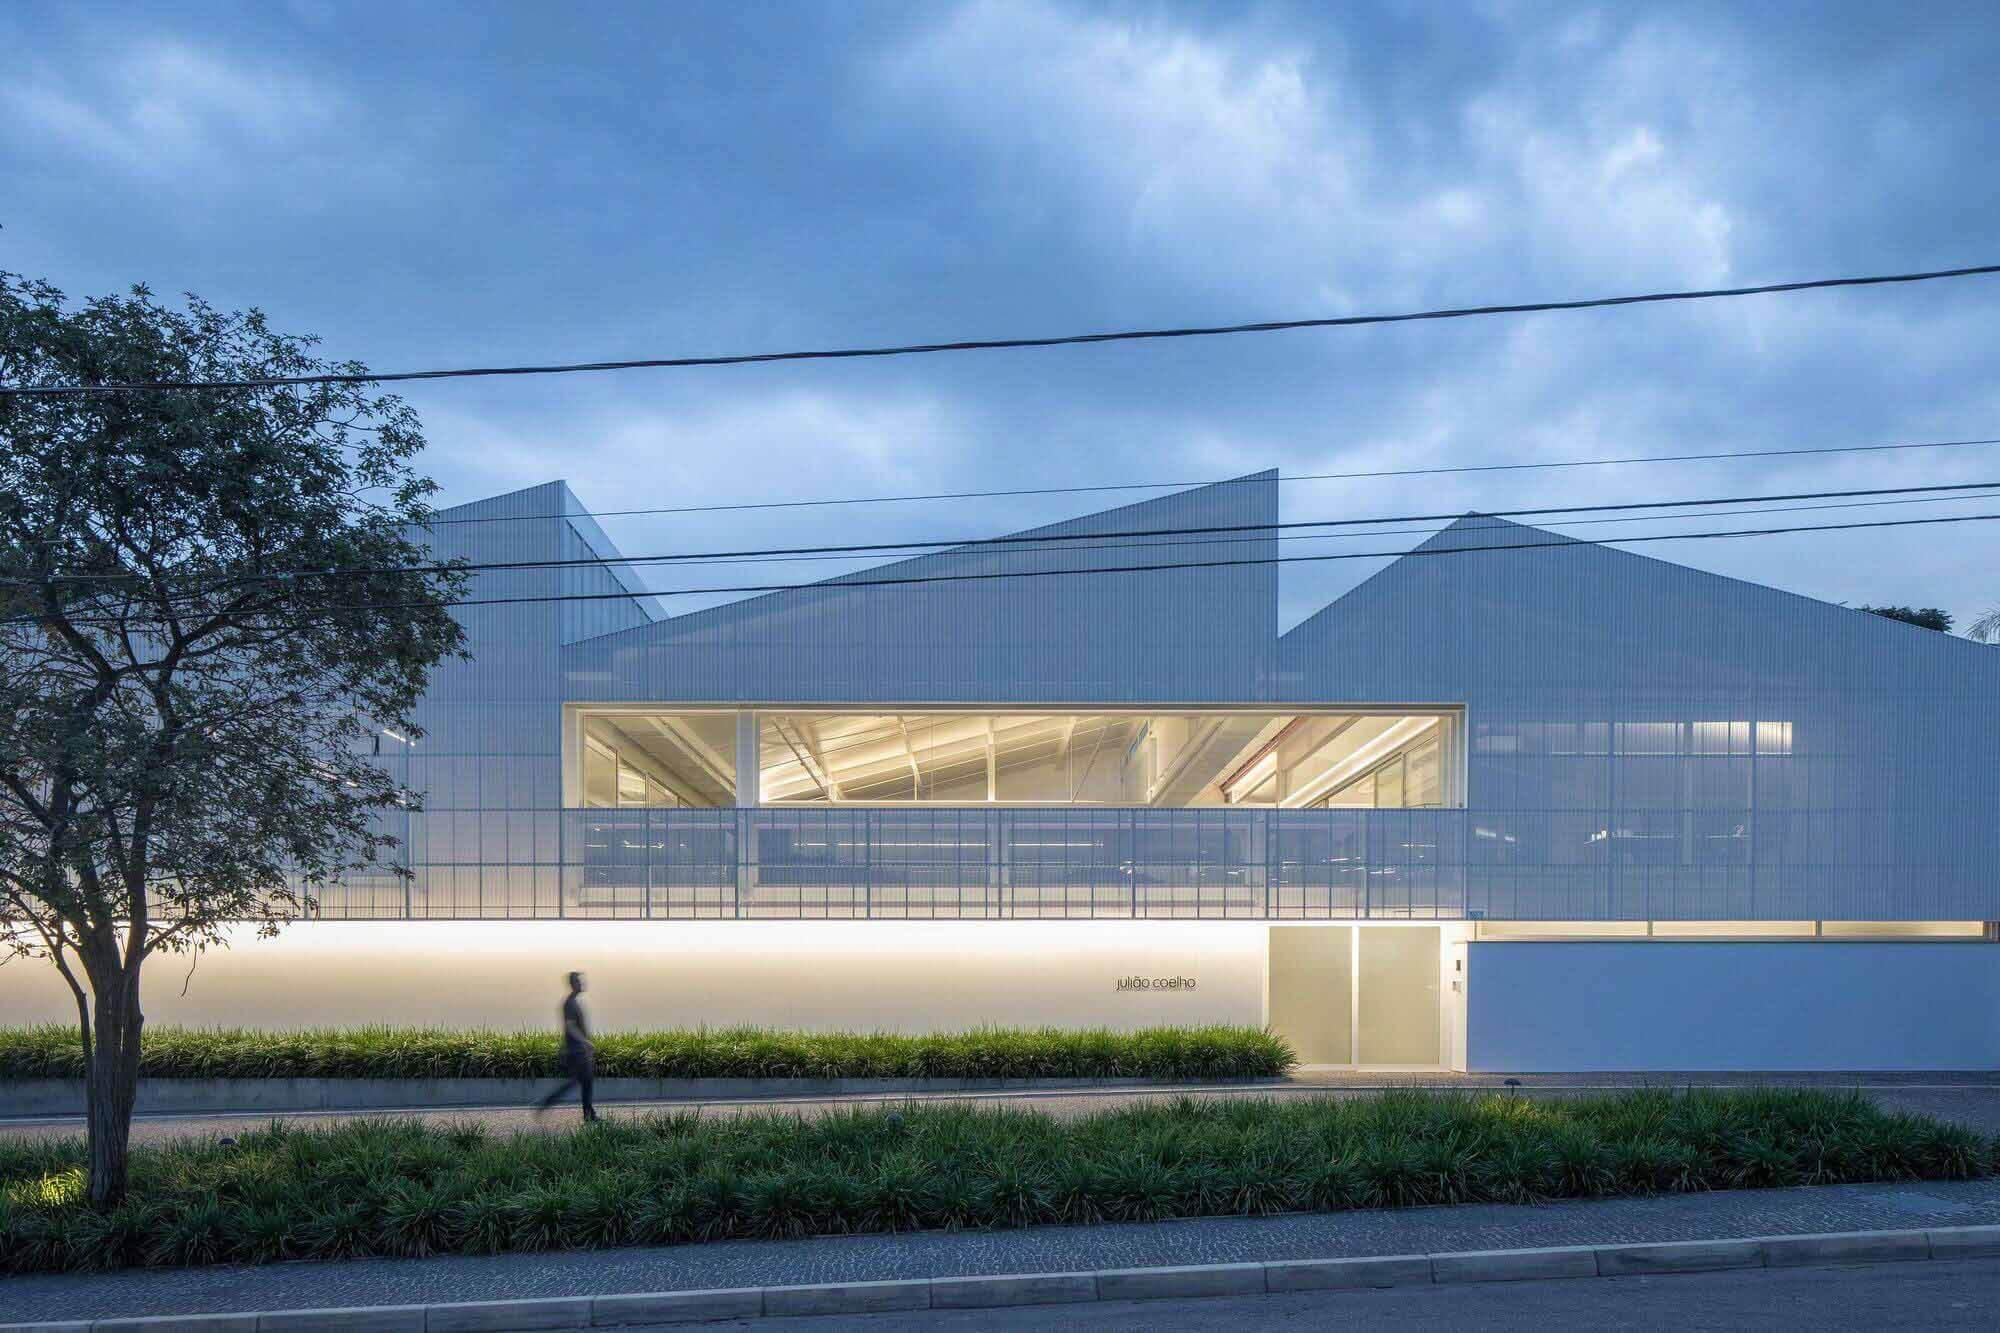 Штаб-квартира юридической фирмы / BLOCO Arquitetos + Renata Dutra Arquitetura